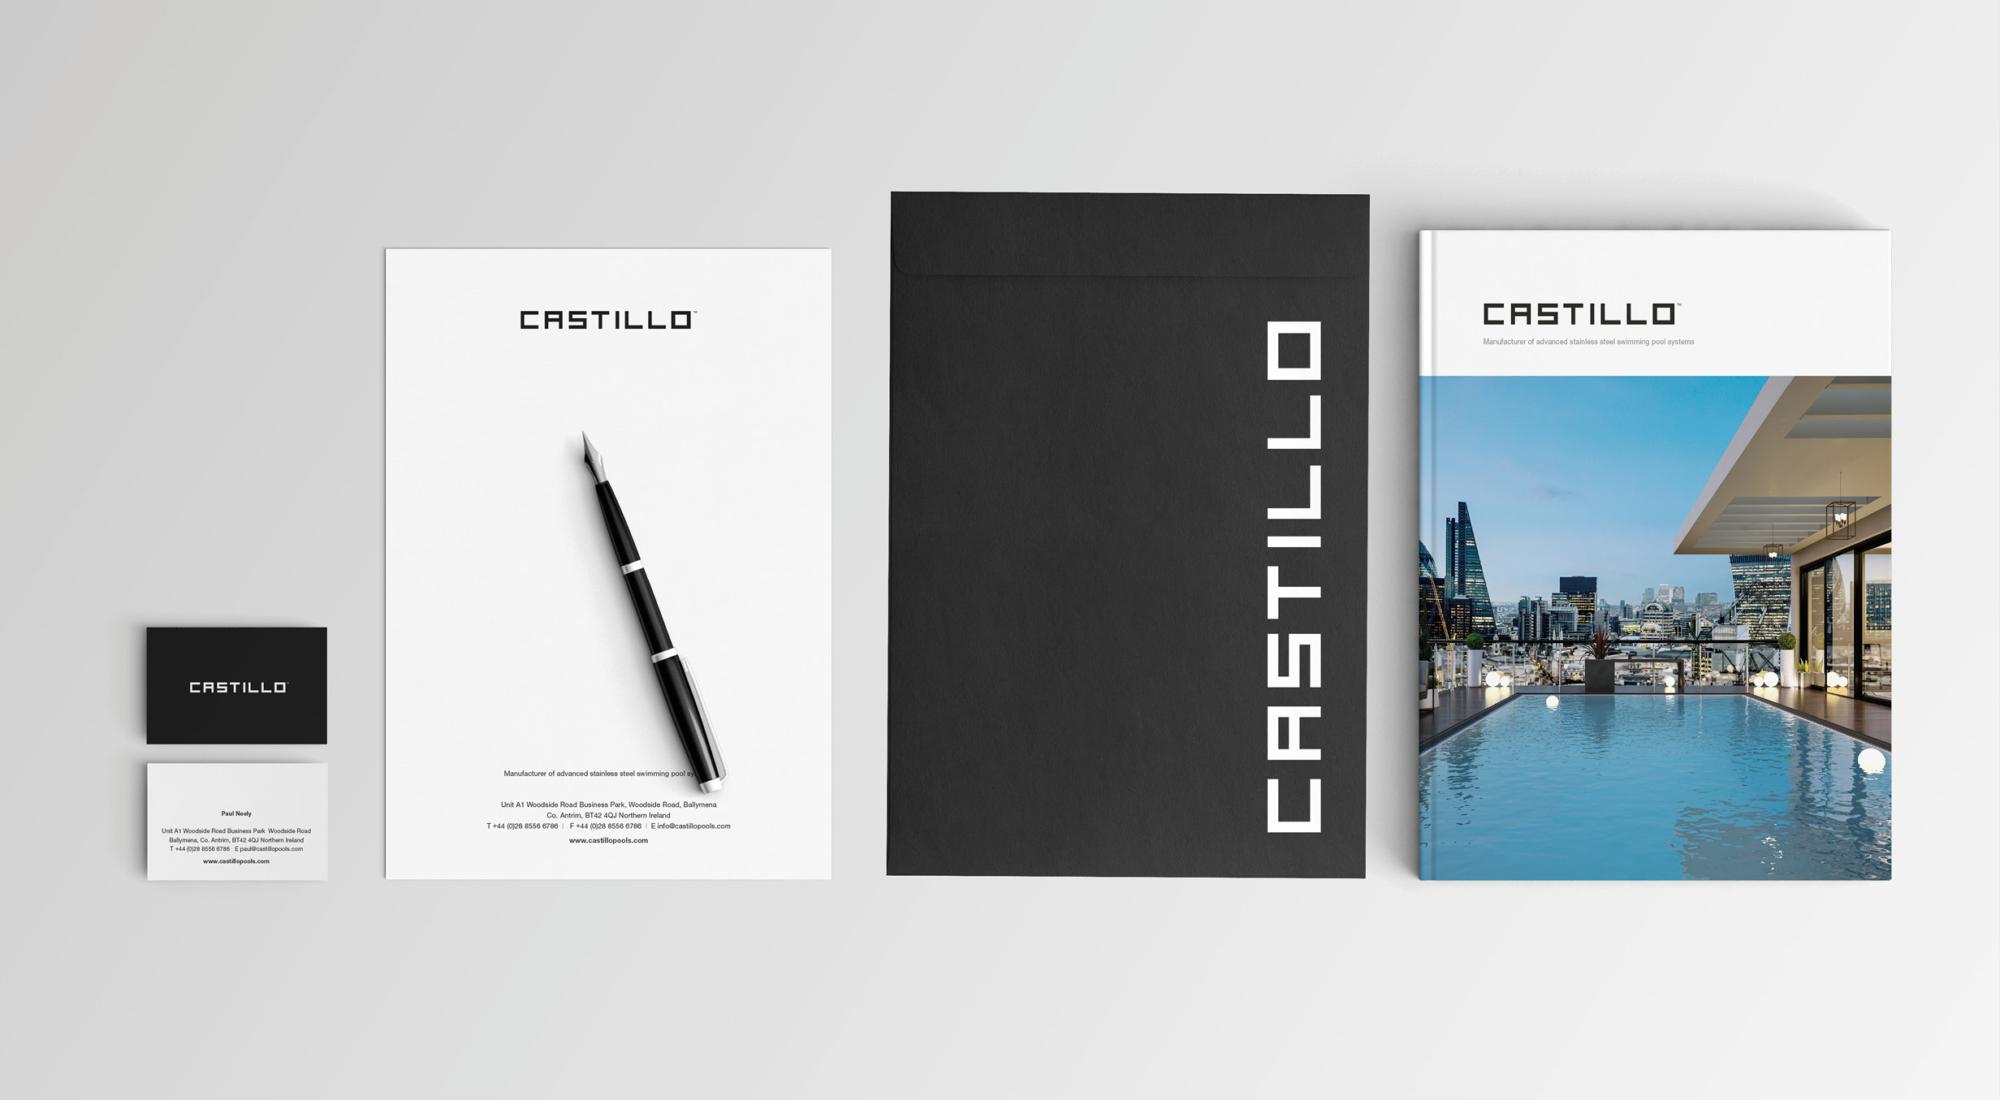 https://alanjacksondesign.co.uk/wp-content/uploads/2021/09/castillo-pools-img3.jpg